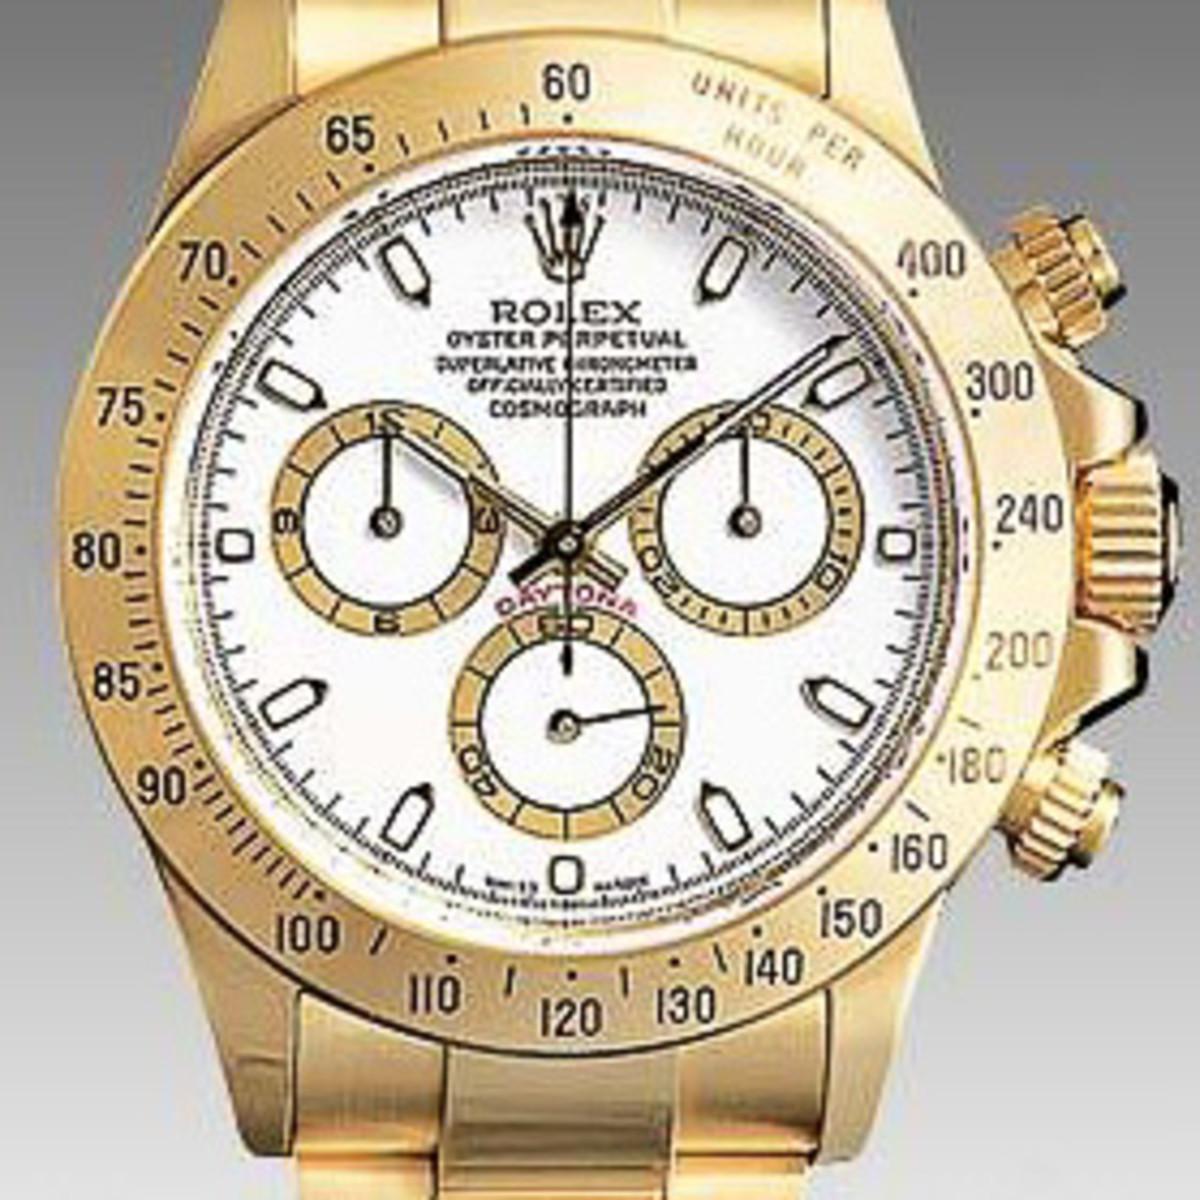 News_Rolex_Cosmograph_Daytona_watch